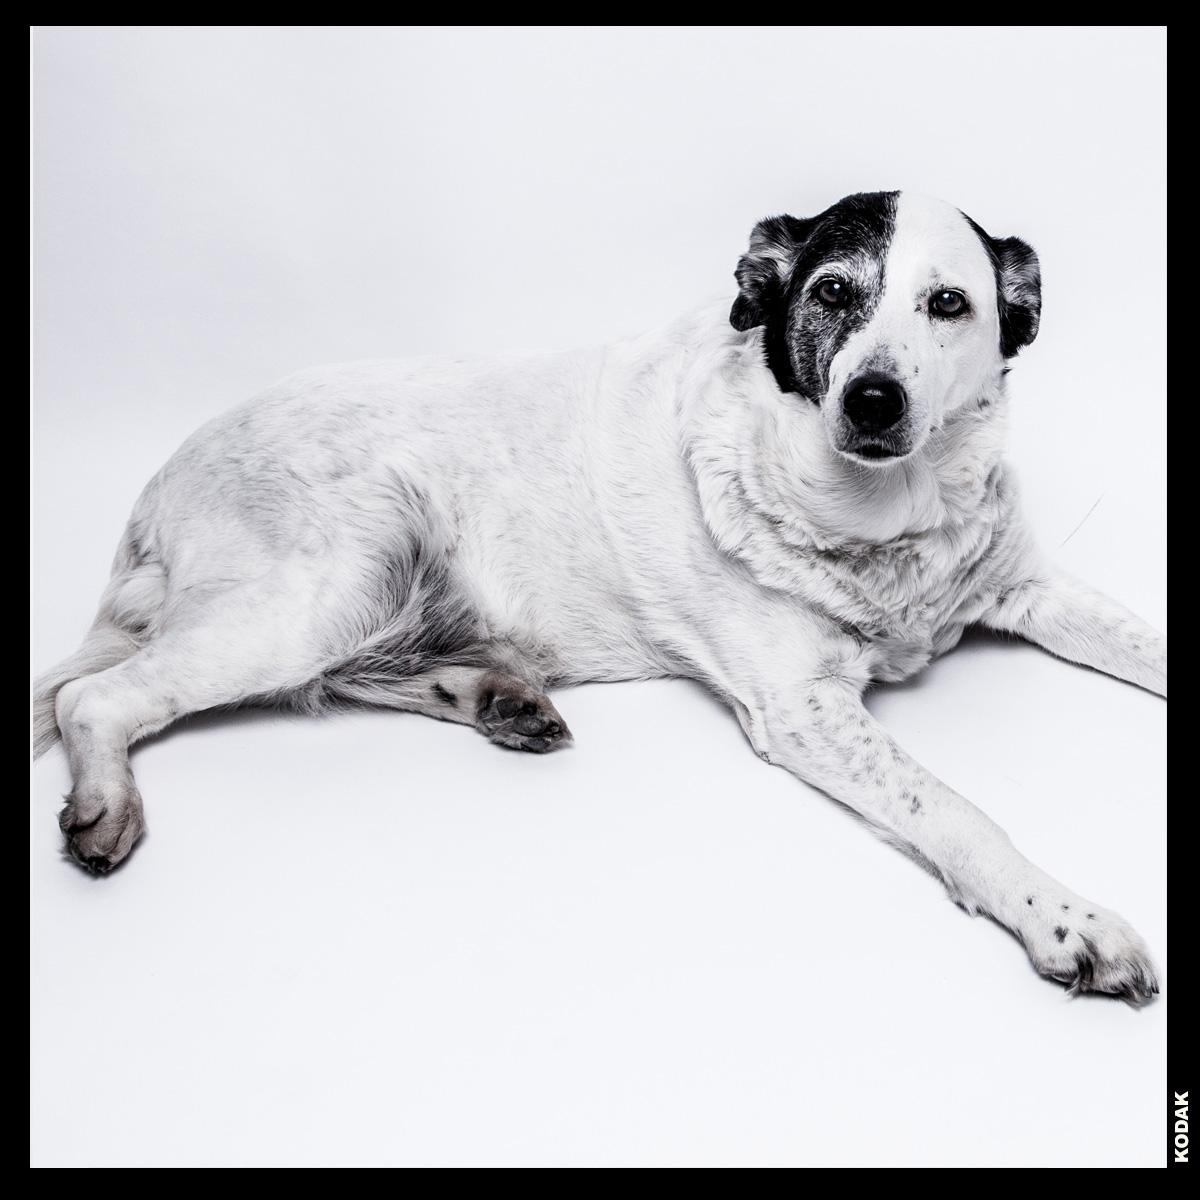 Maisie RIP - Maisie loving Dog